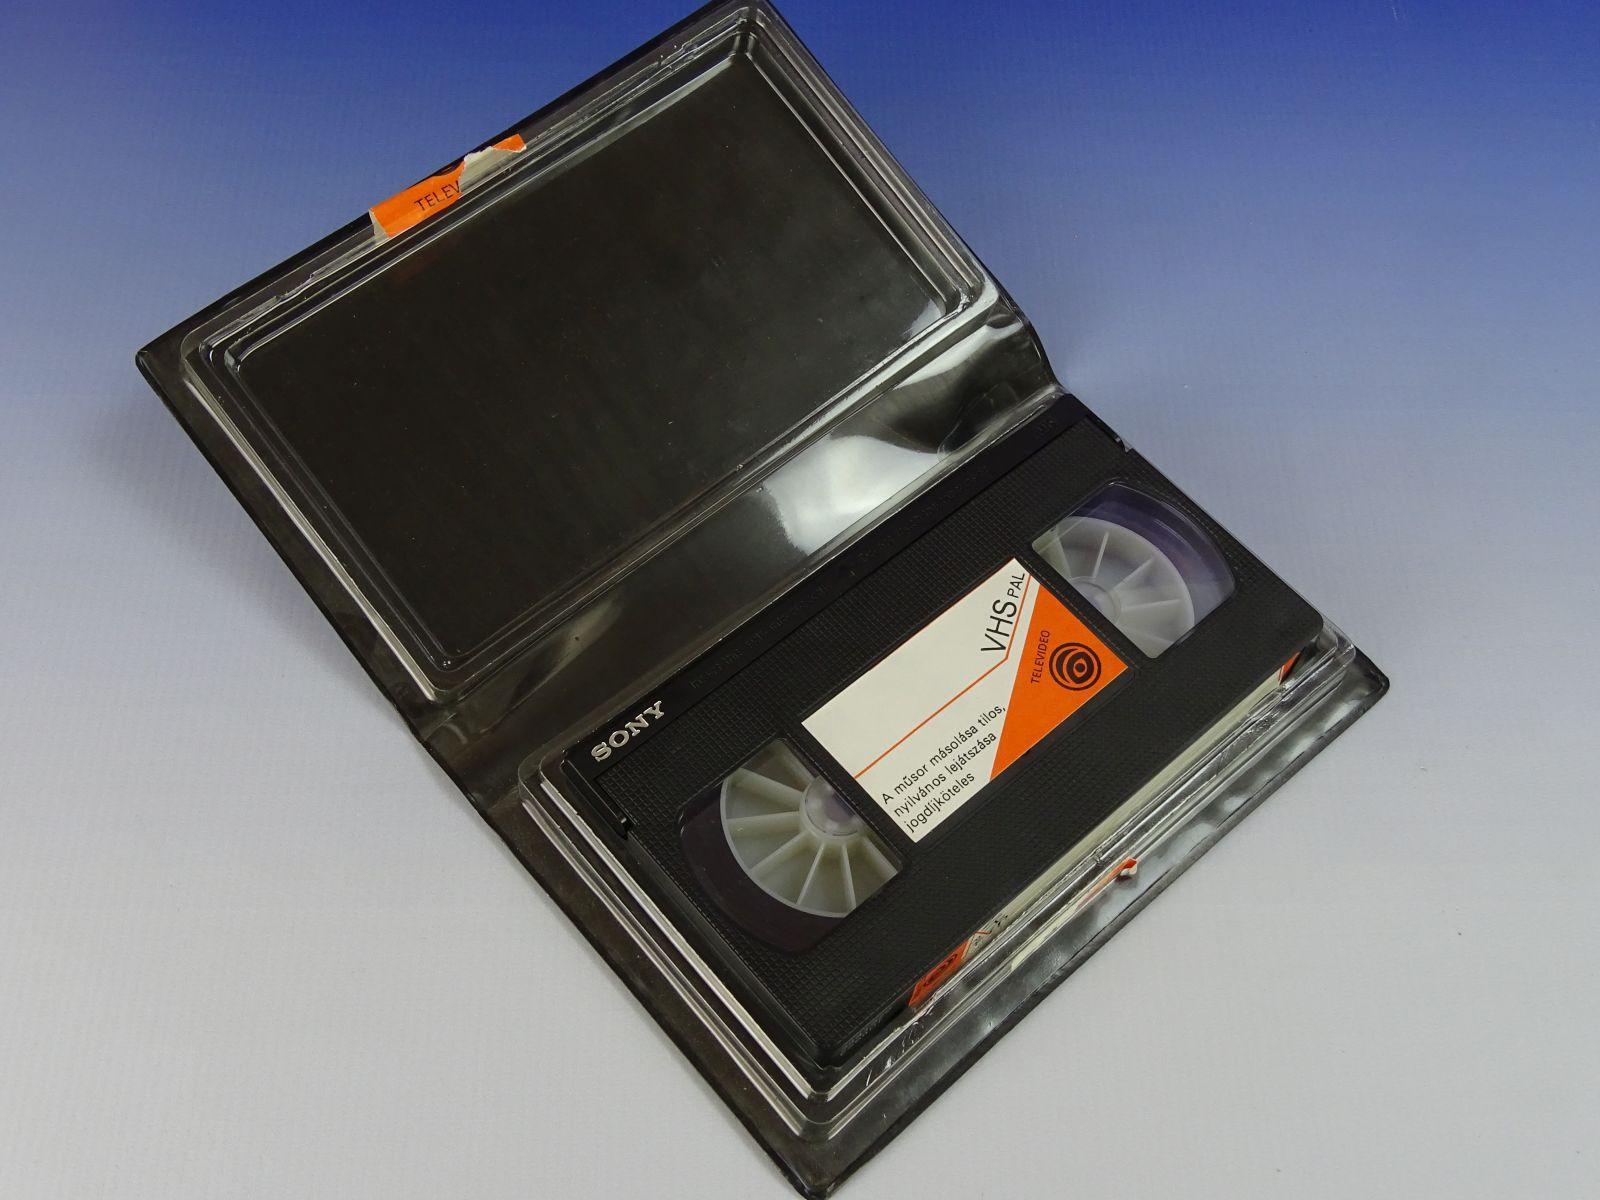 DSC07780.JPG (1600�1200)